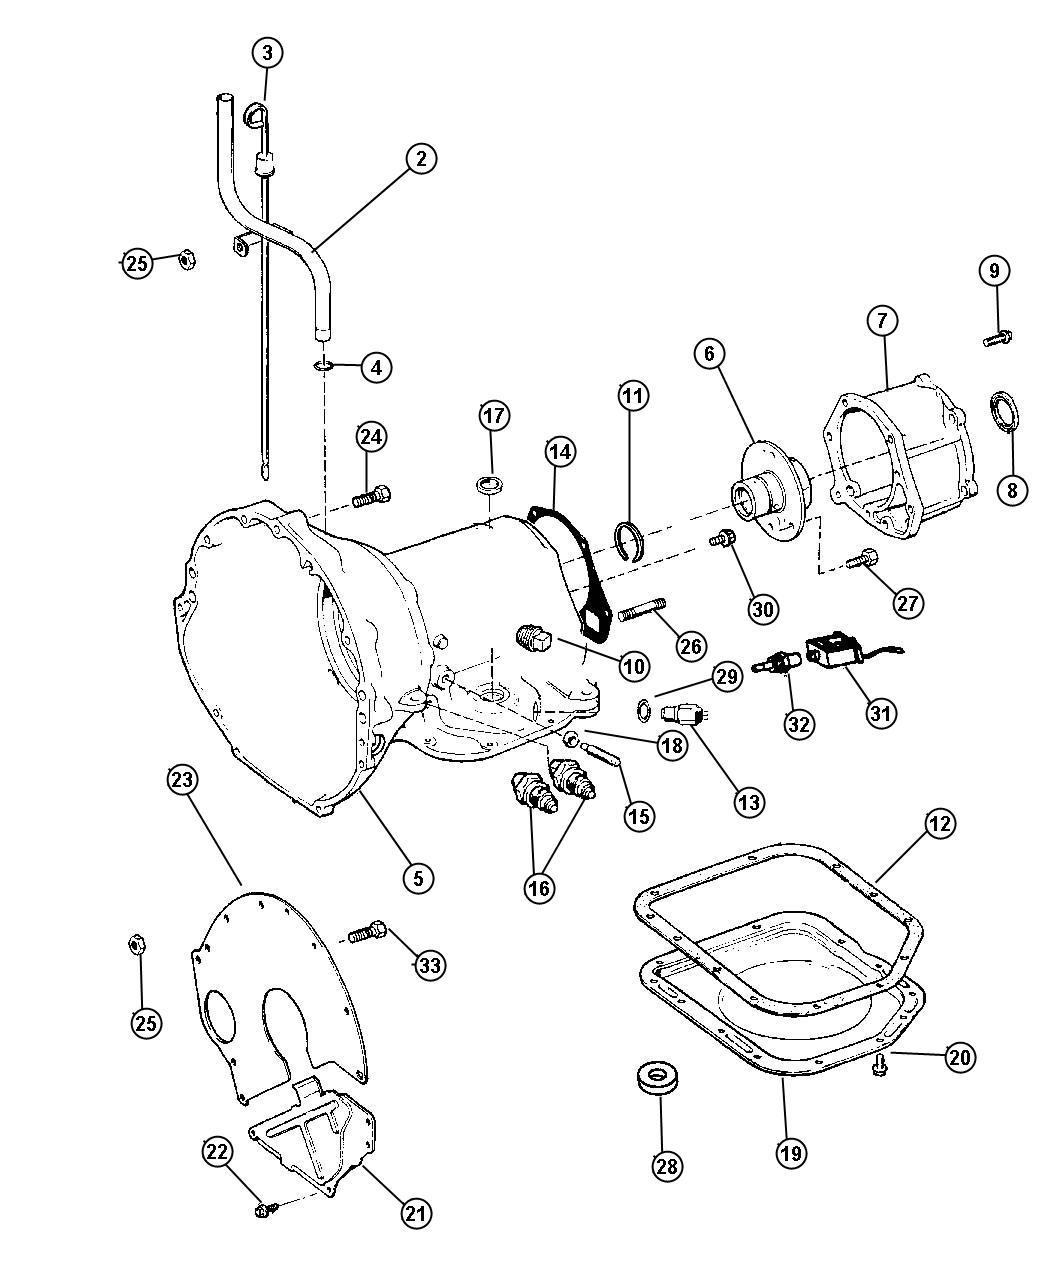 mopar yj wiring diagram to 56038235 jeep connector    wiring    dgd    mopar    parts overstock  56038235 jeep connector    wiring    dgd    mopar    parts overstock